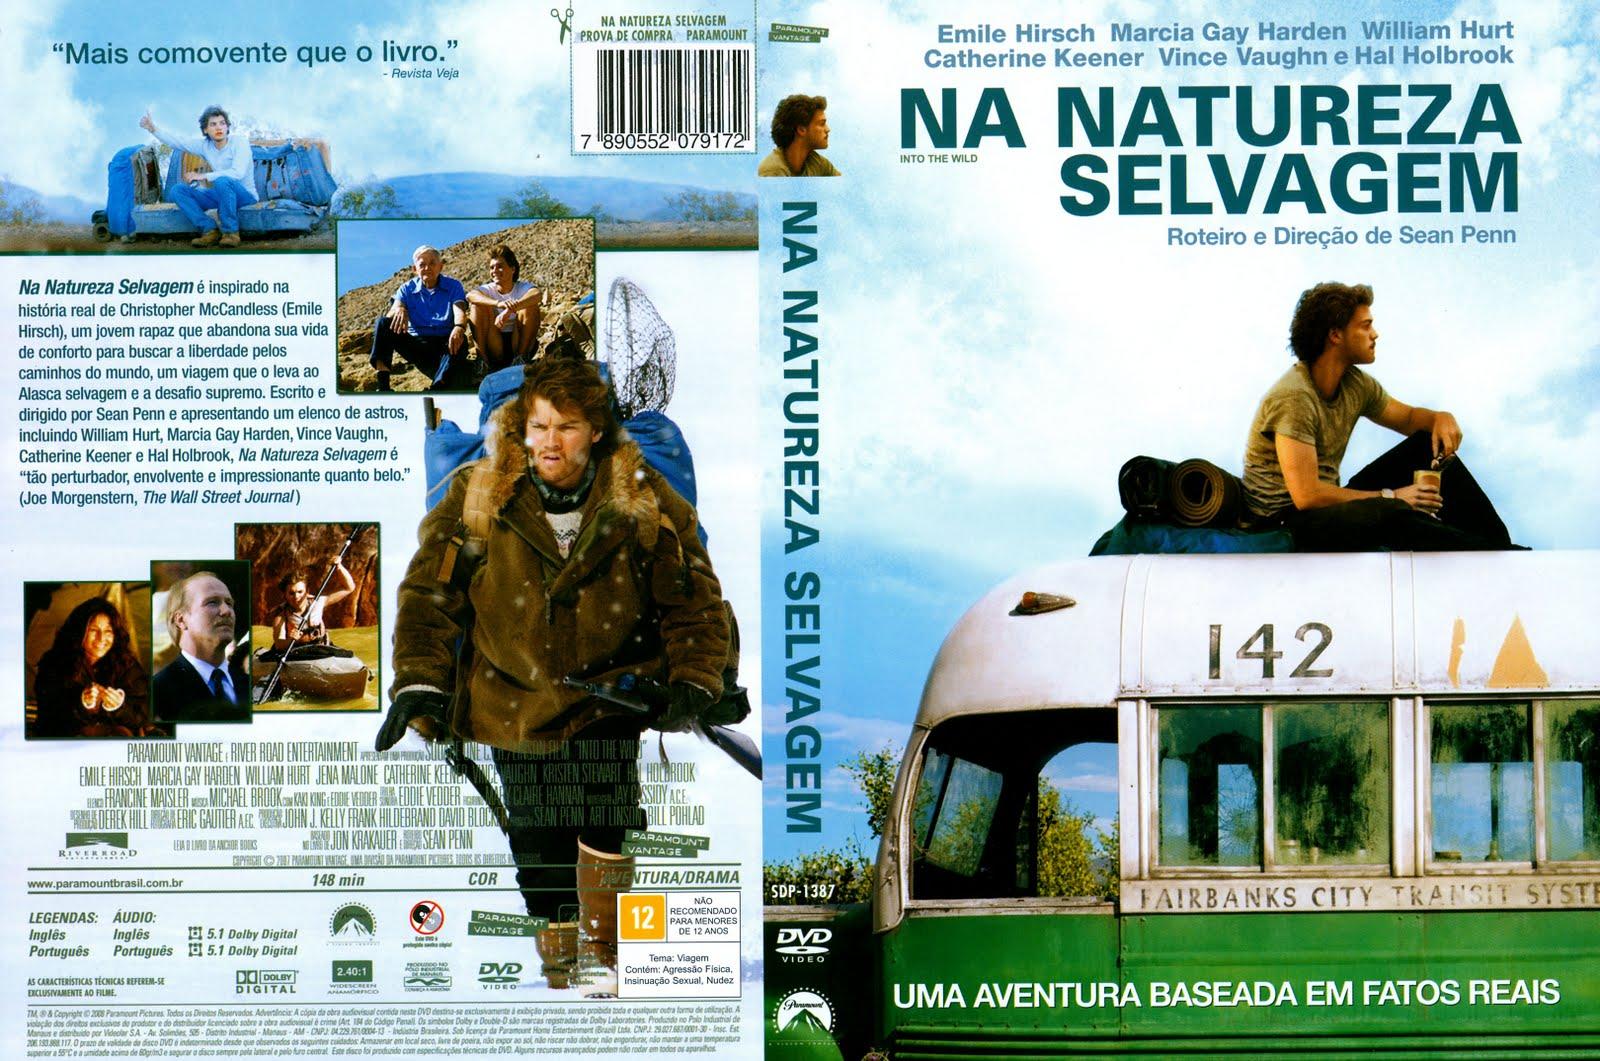 http://3.bp.blogspot.com/-rql89X1-YKs/TpHnqQtrMJI/AAAAAAAABNw/2EZ2LJHo0_g/s1600/Na+Natureza+Selvagem.jpg